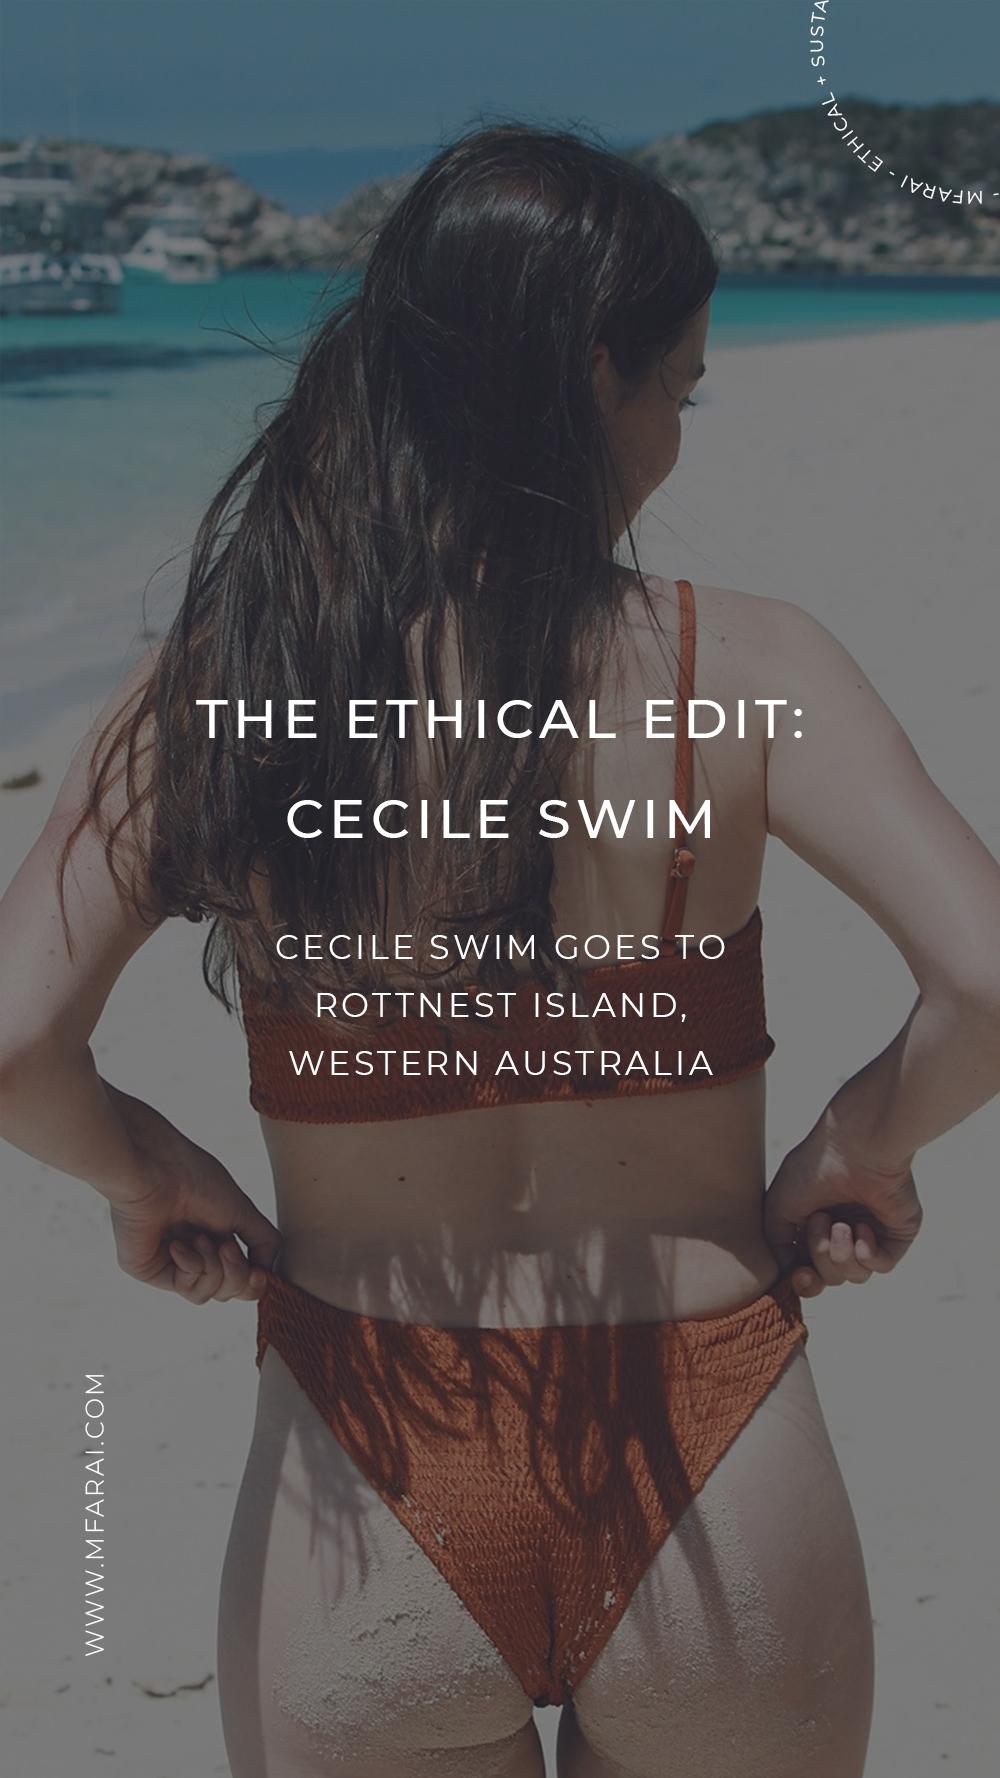 Cecile Swim Ethical Swimwear